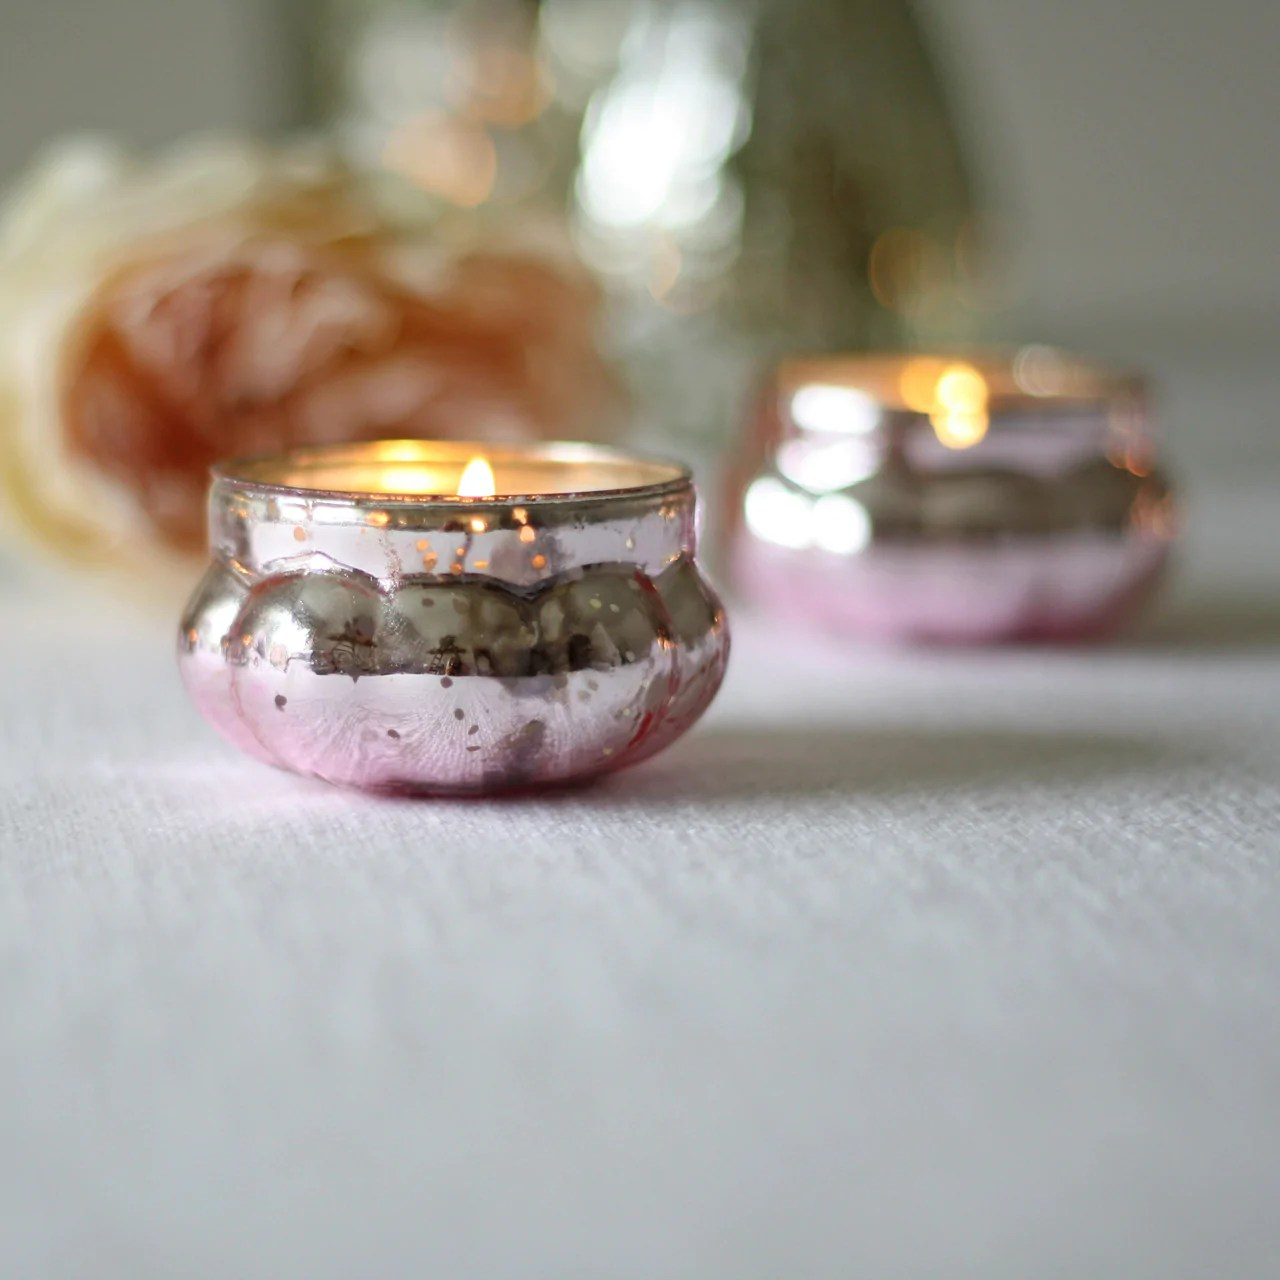 Mini Mercury Pink Floating Tea Light Holders – The Wedding of My Dreams